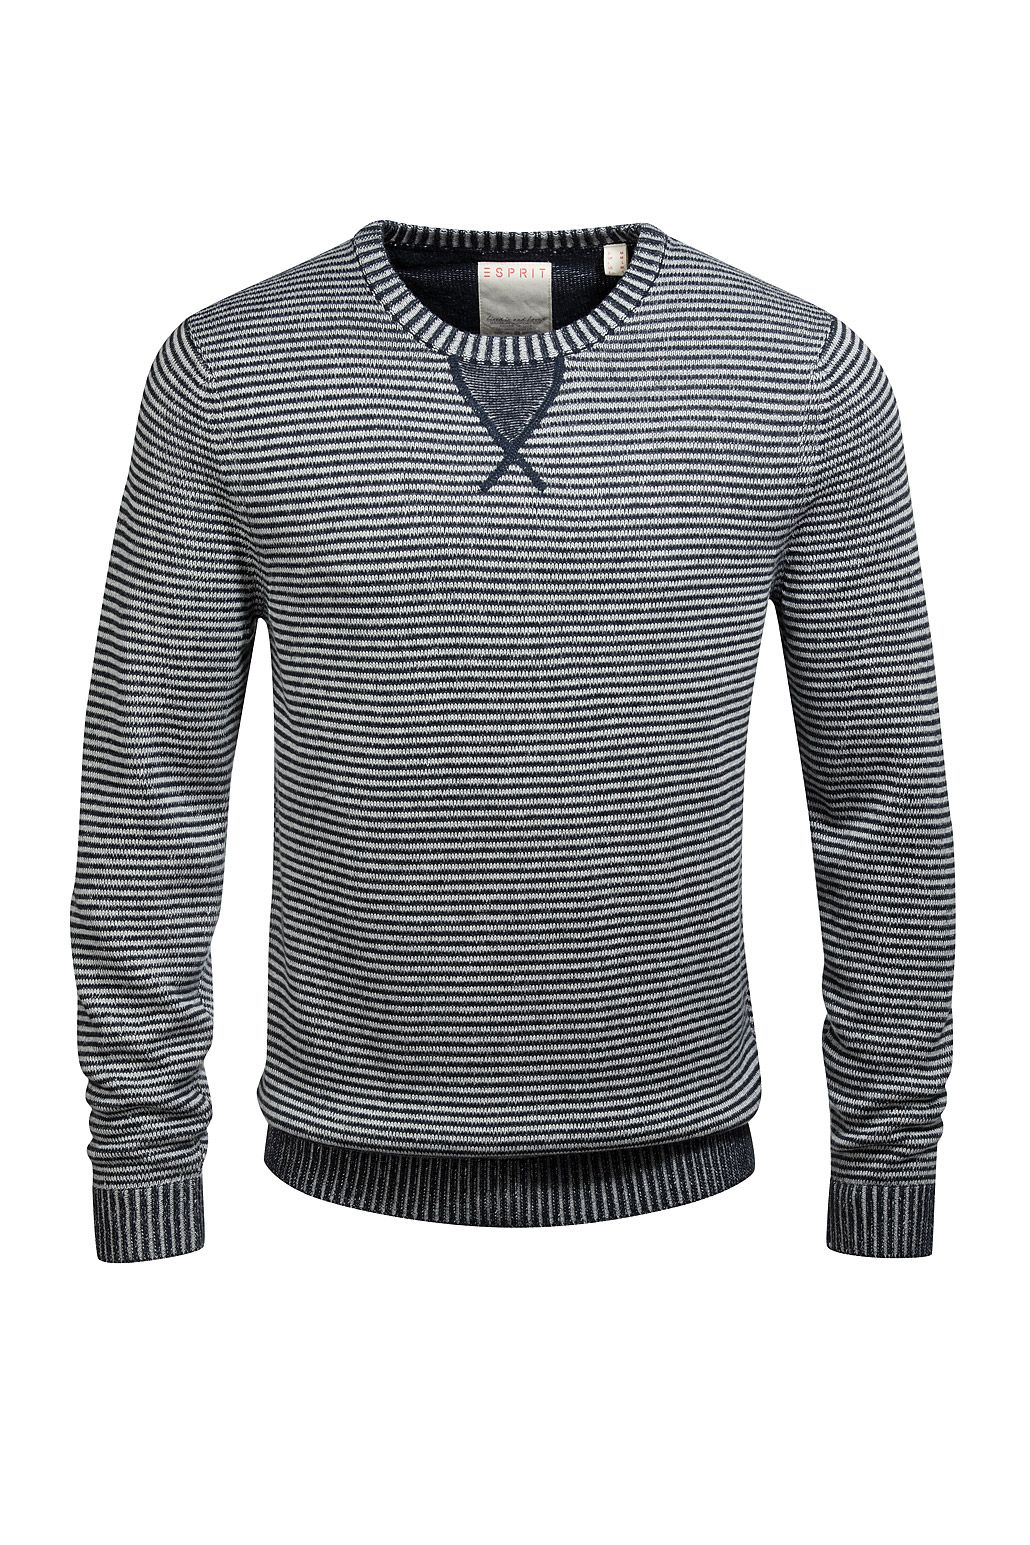 d547ffa16eb3a8 Baumw./Kaschmir Ringelpulli CASUAL - Esprit Online-Shop | Fabulous ...